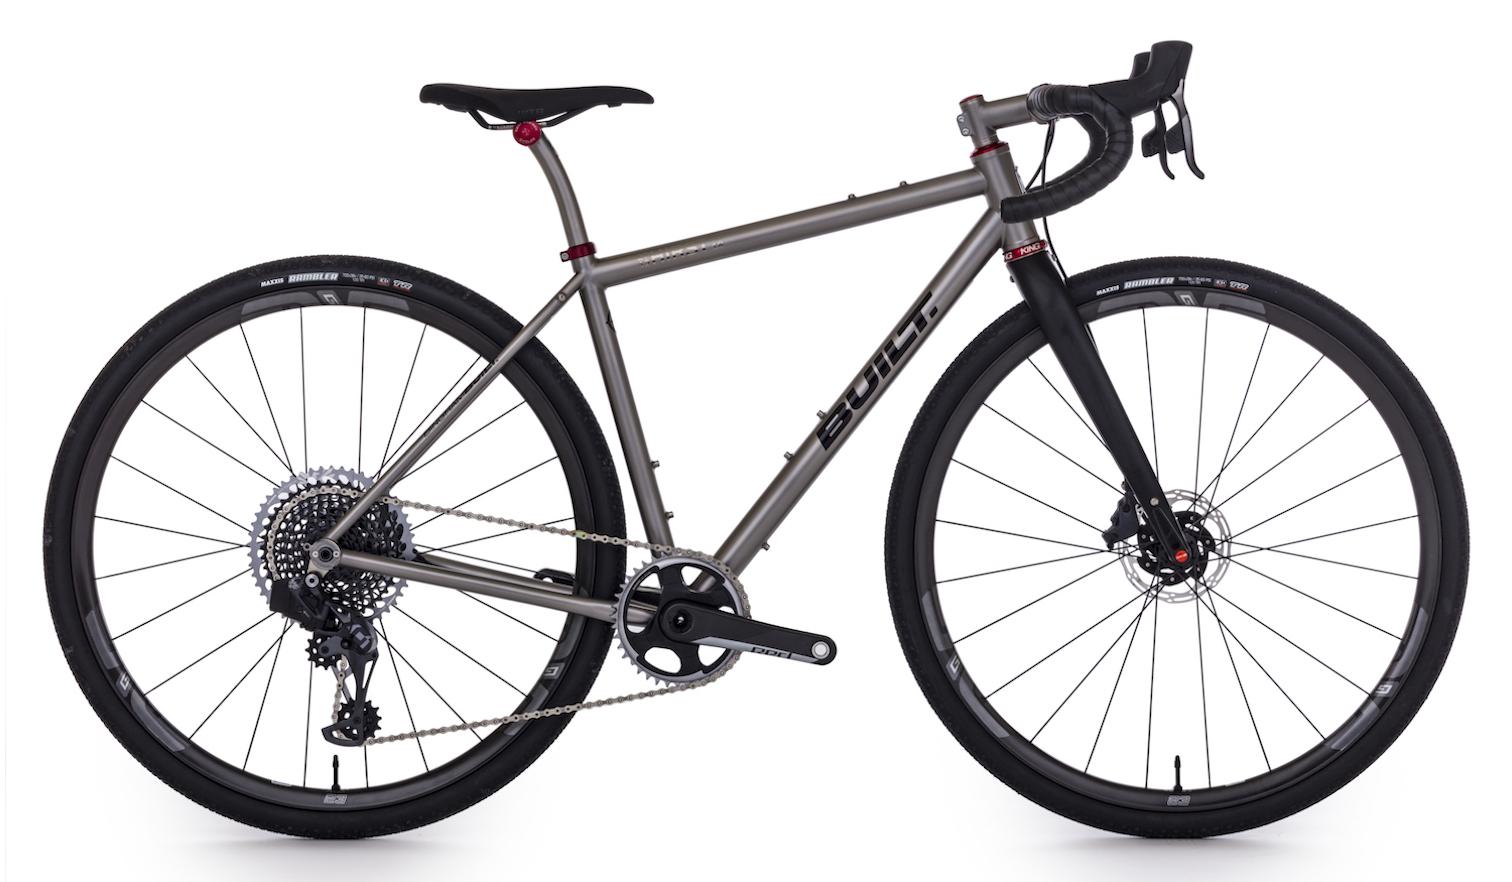 Gravel Bike: Sram Red/Force AXS